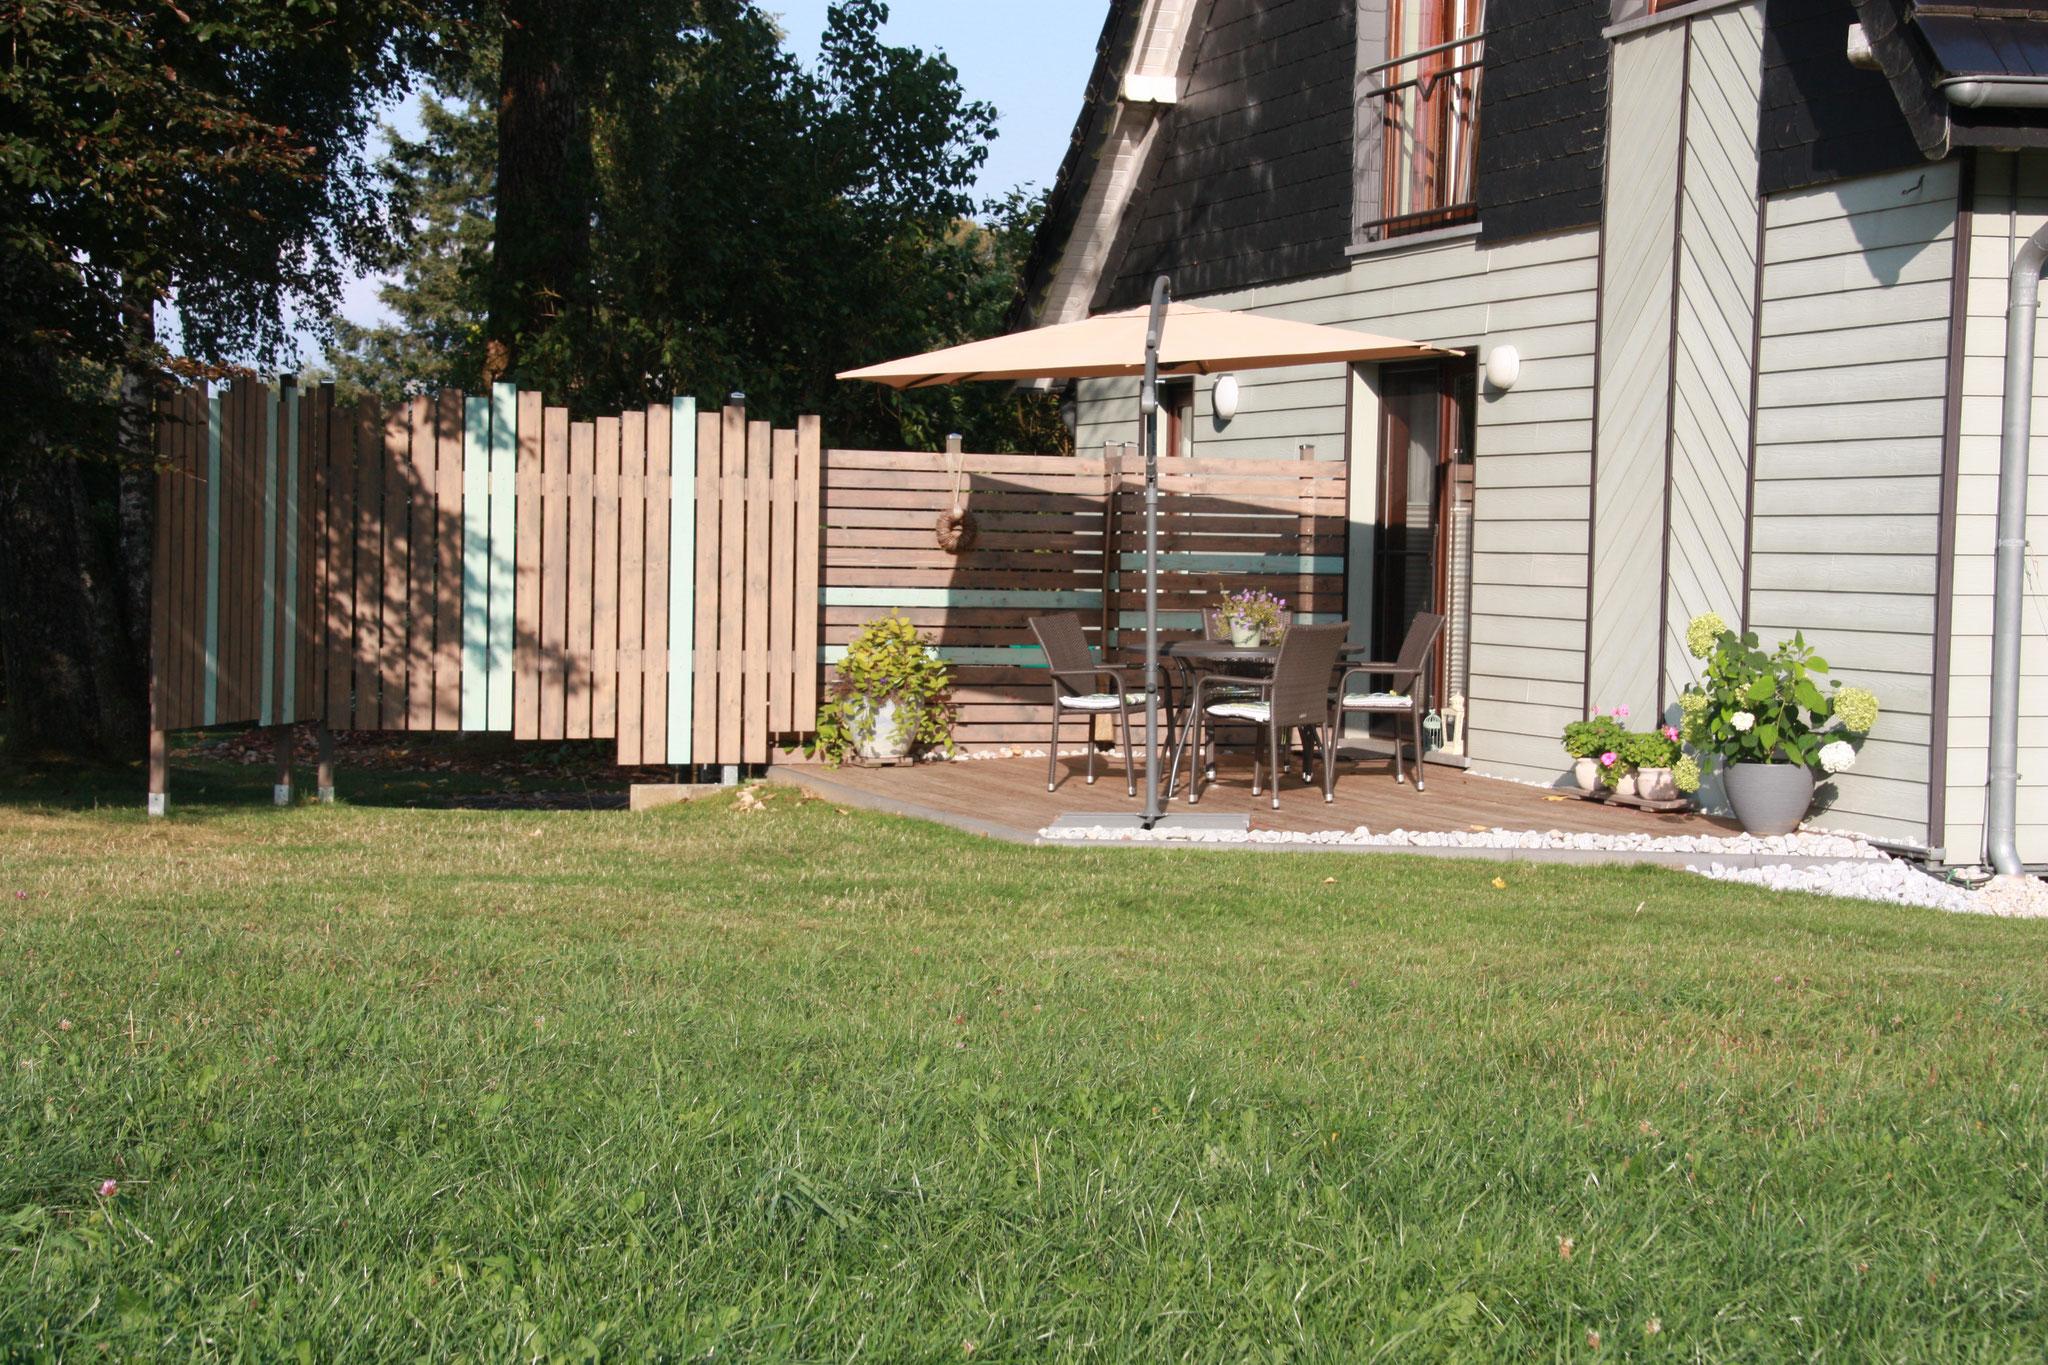 Die Terrasse zur Garten- und Waldseite  | Het terras aan de tuin- en boszijde  |  From the terrace enjoy a beautiful view of the countryside